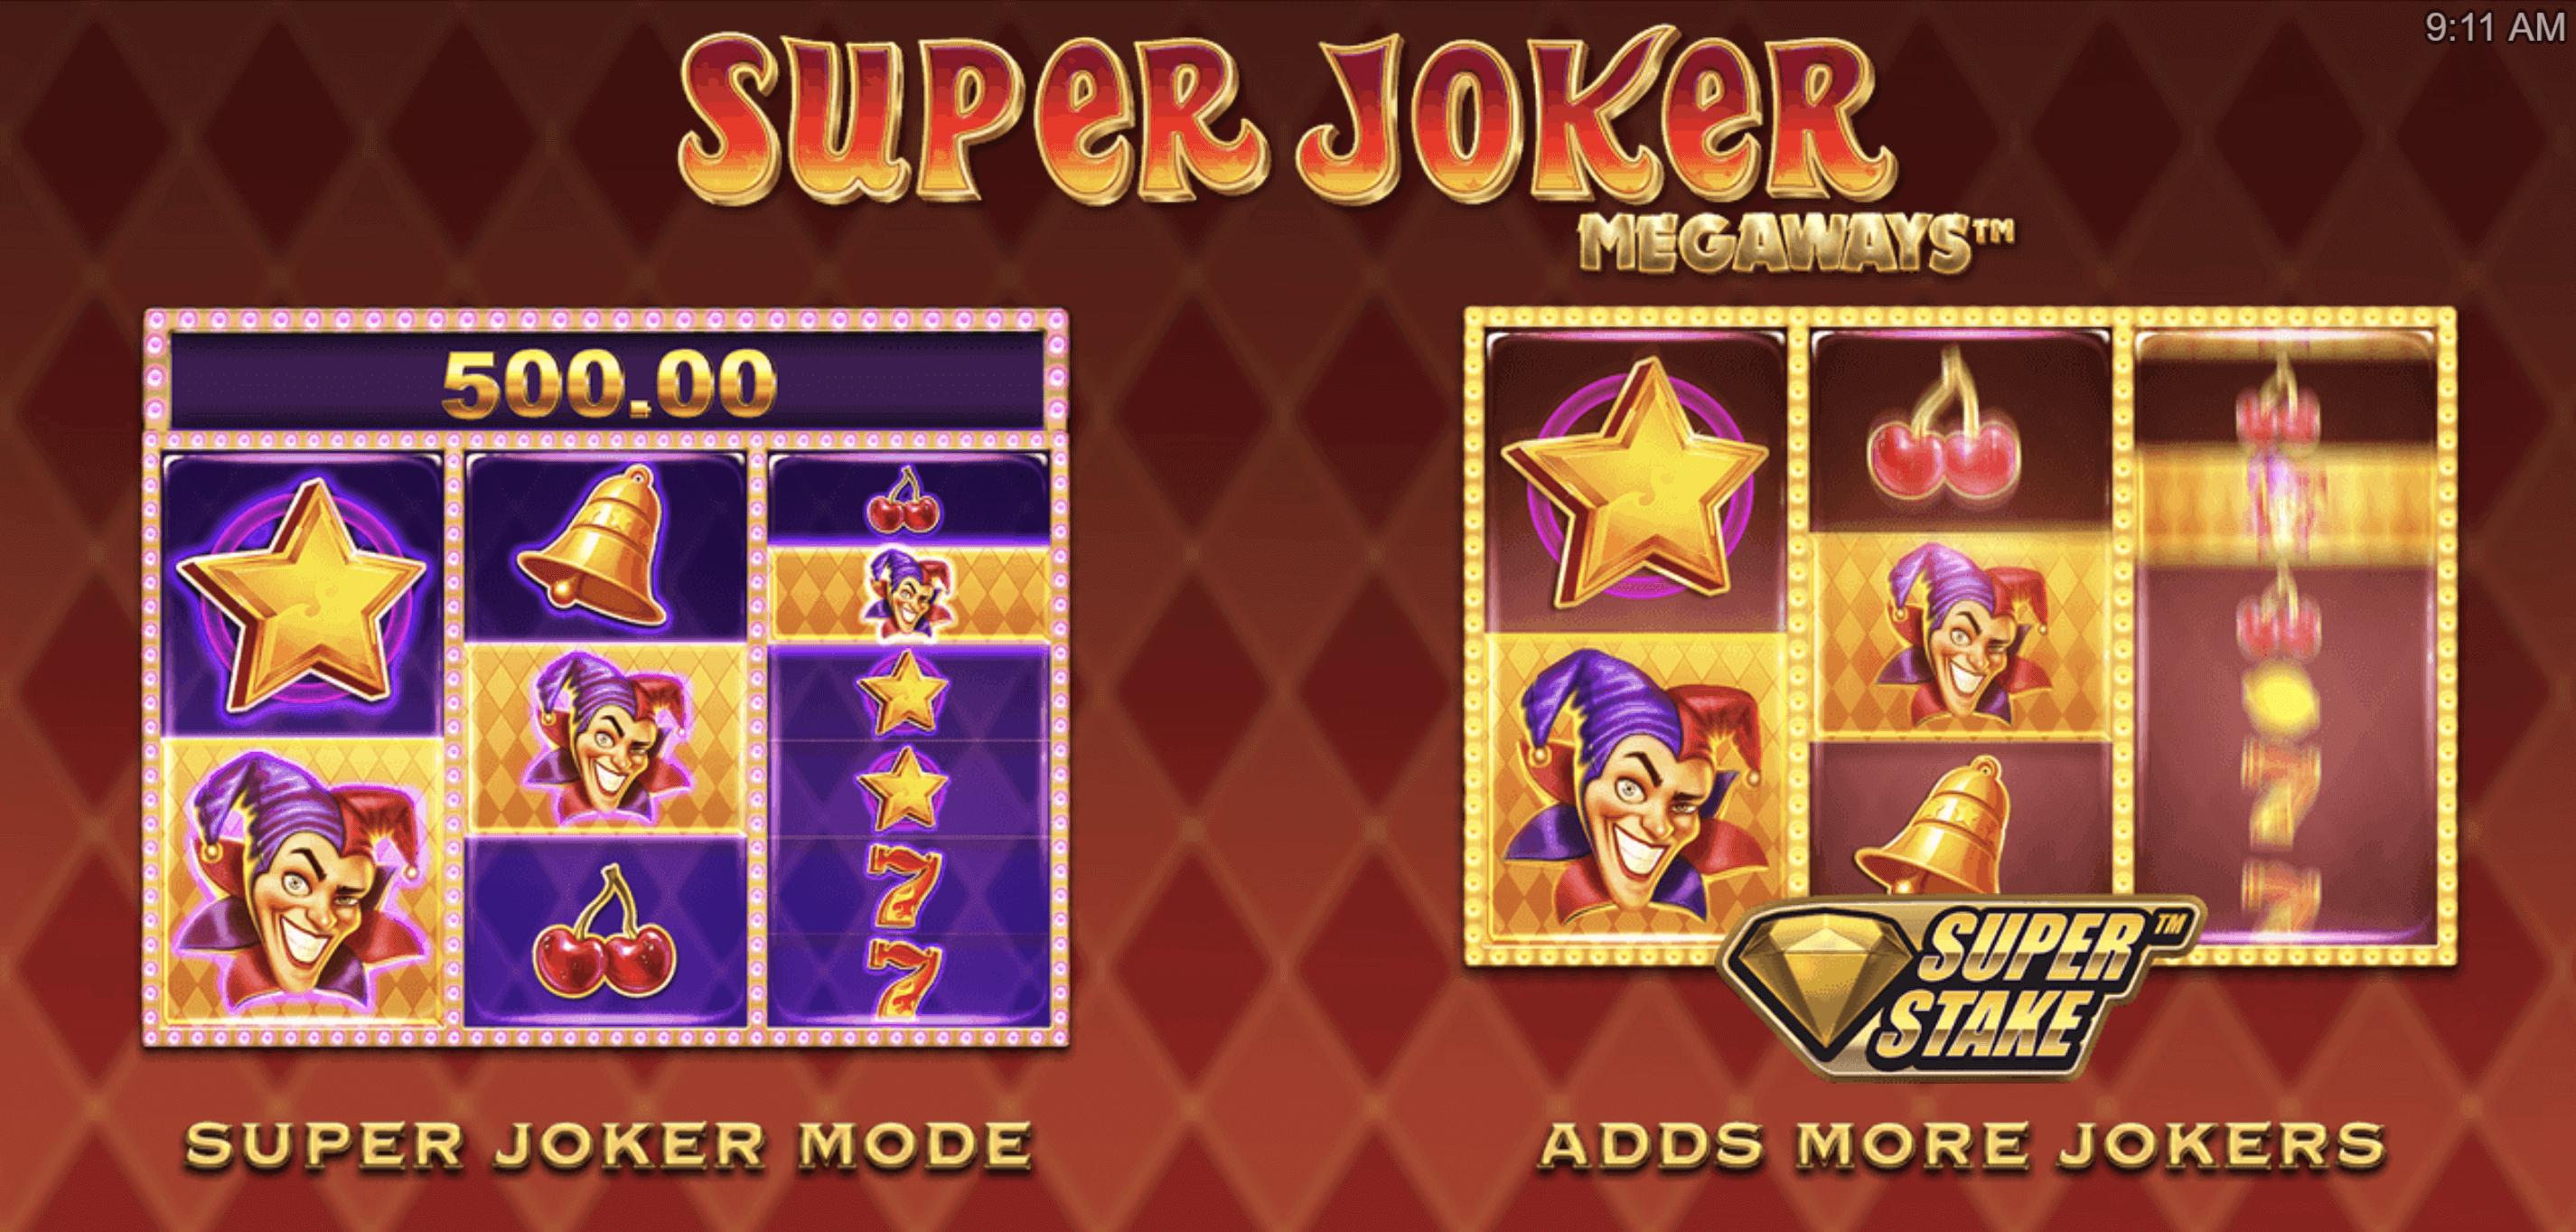 Super Joker Megaways Features